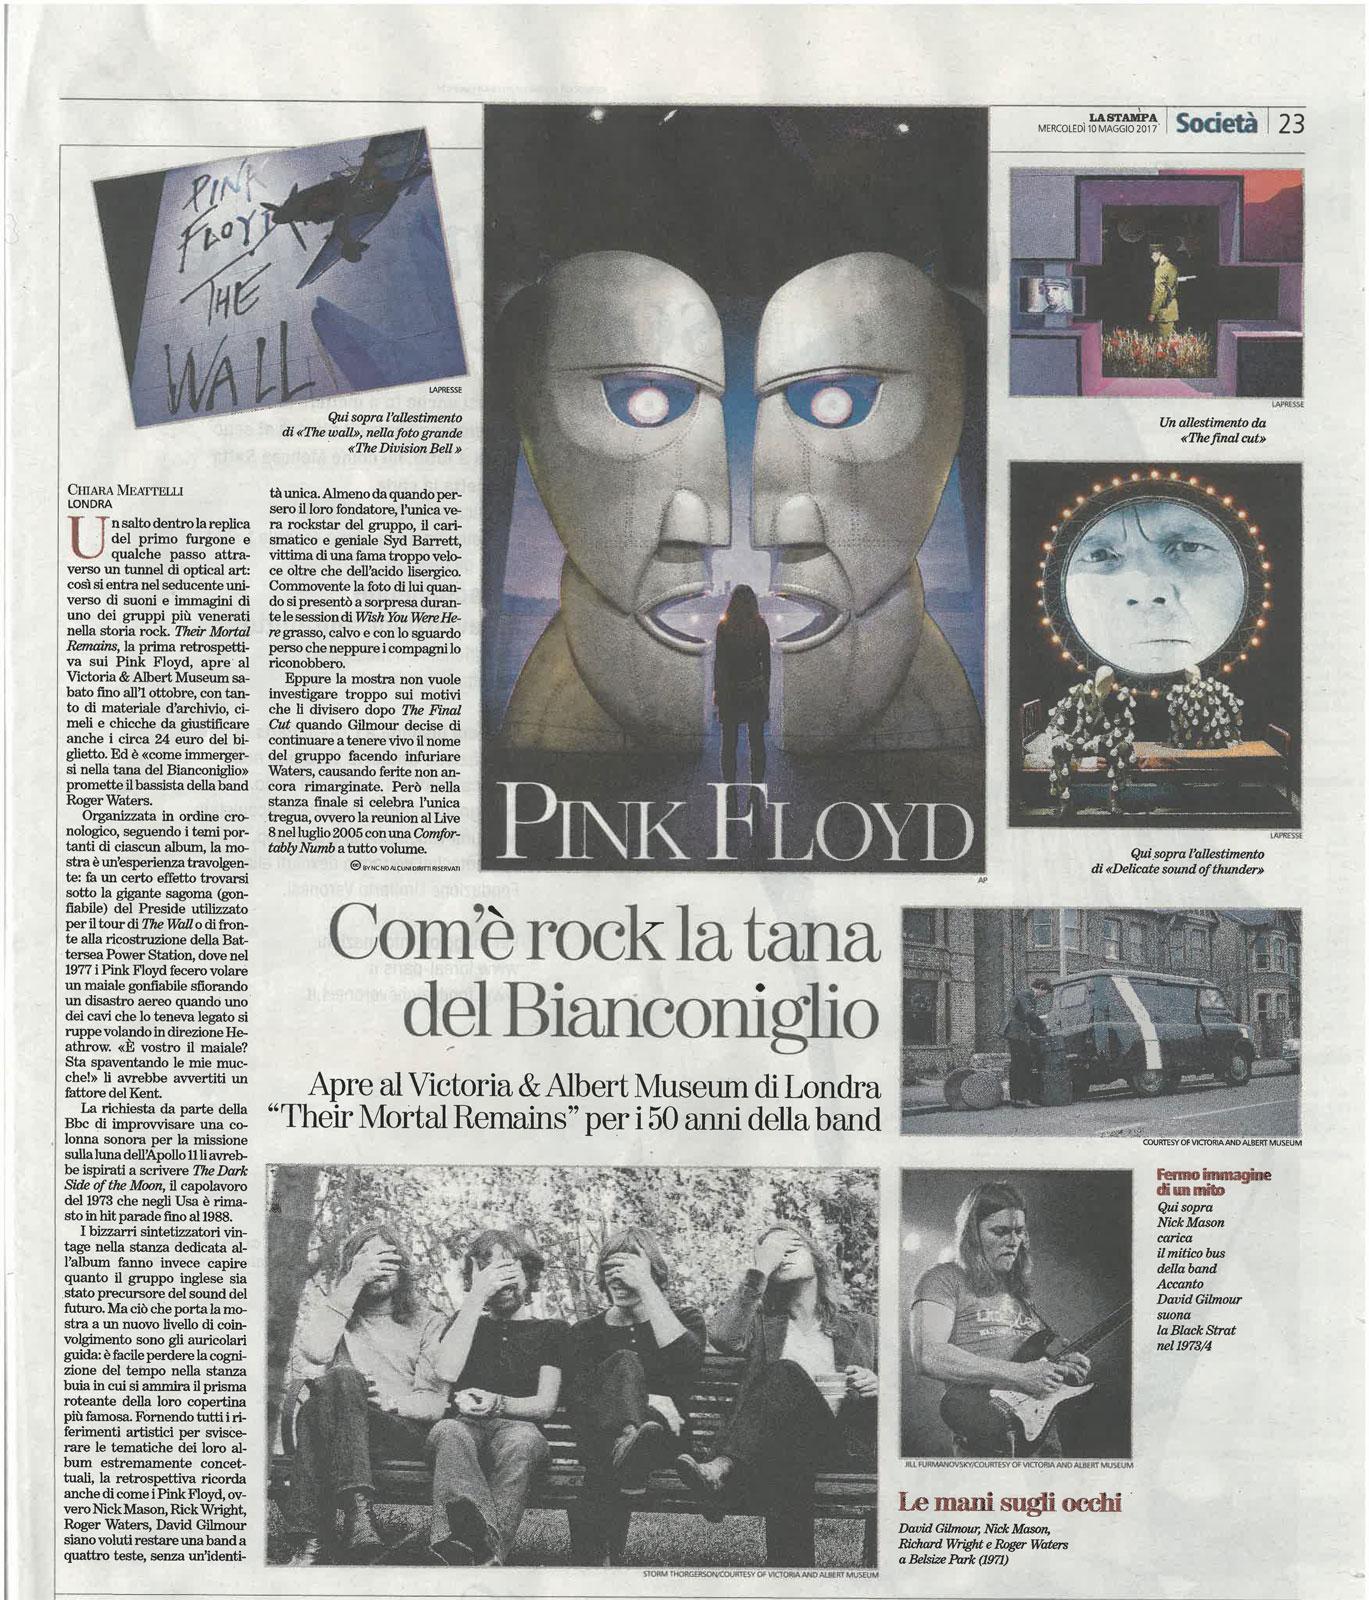 La Stampa: Pink Floyd exhibition